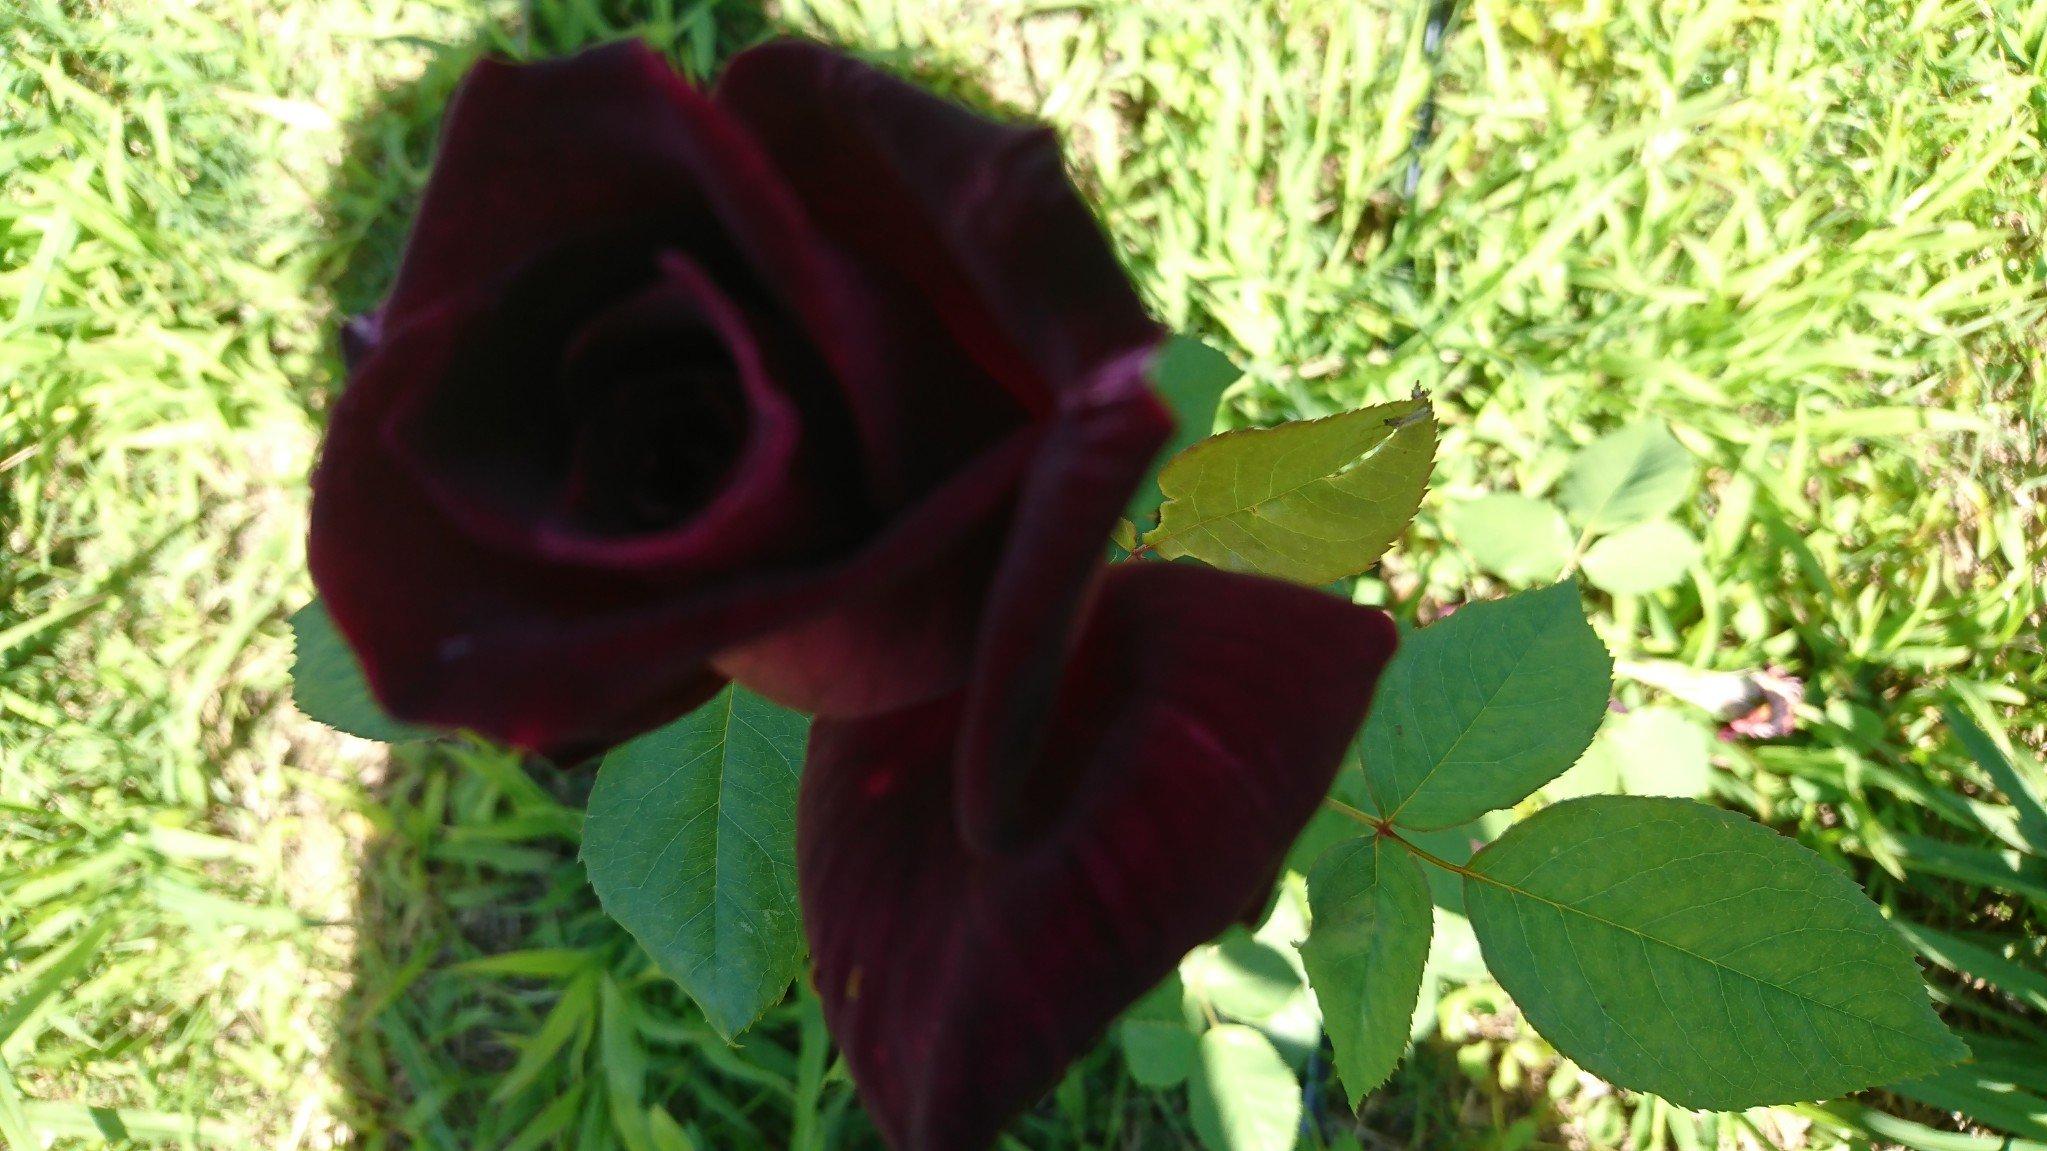 The RSL Rose